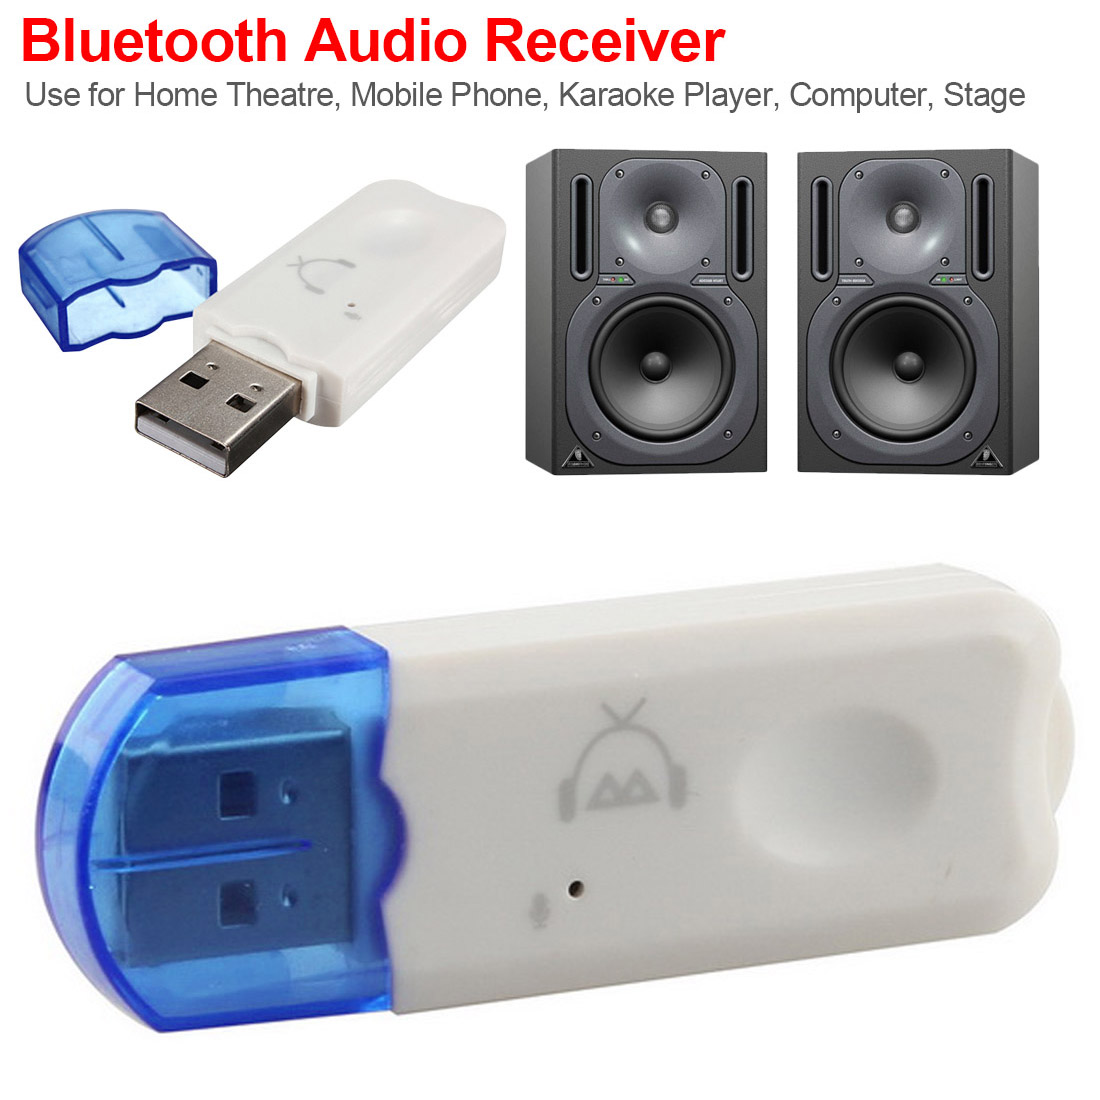 Mini Portable USB Wireless Bluetooth V2.1 Stereo Music Audio Receiver Adapter Handsfree For TV Car Home SpeakerMini Portable USB Wireless Bluetooth V2.1 Stereo Music Audio Receiver Adapter Handsfree For TV Car Home Speaker